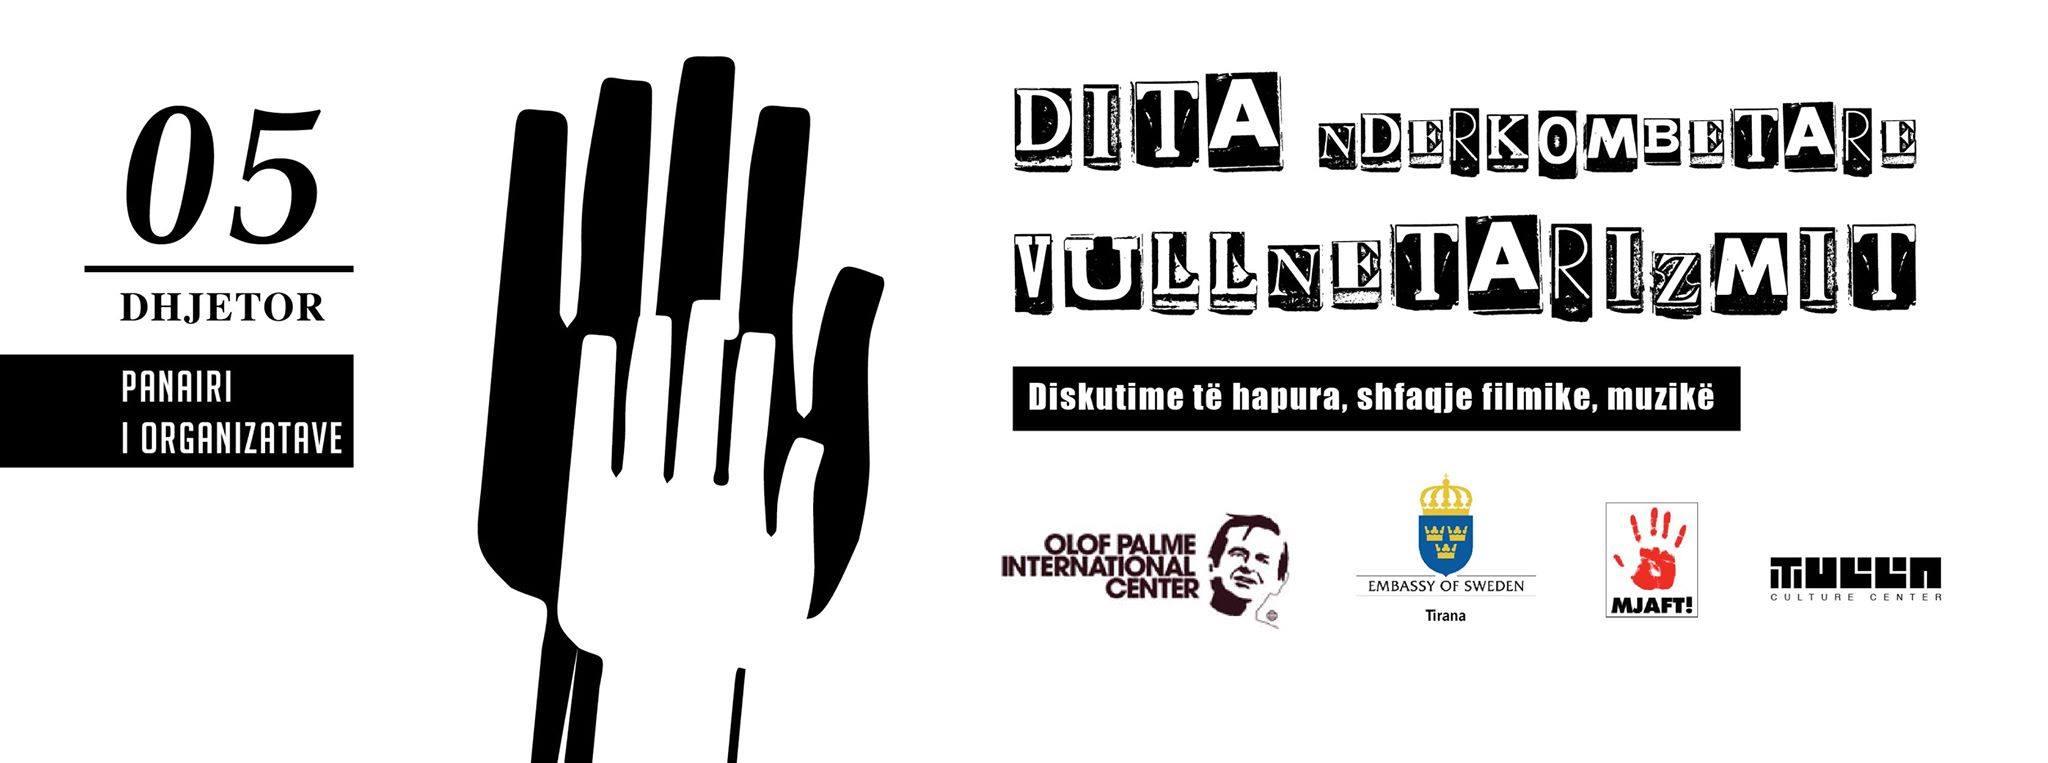 Dita Ndërkombëtare e Vullnetarizmit !